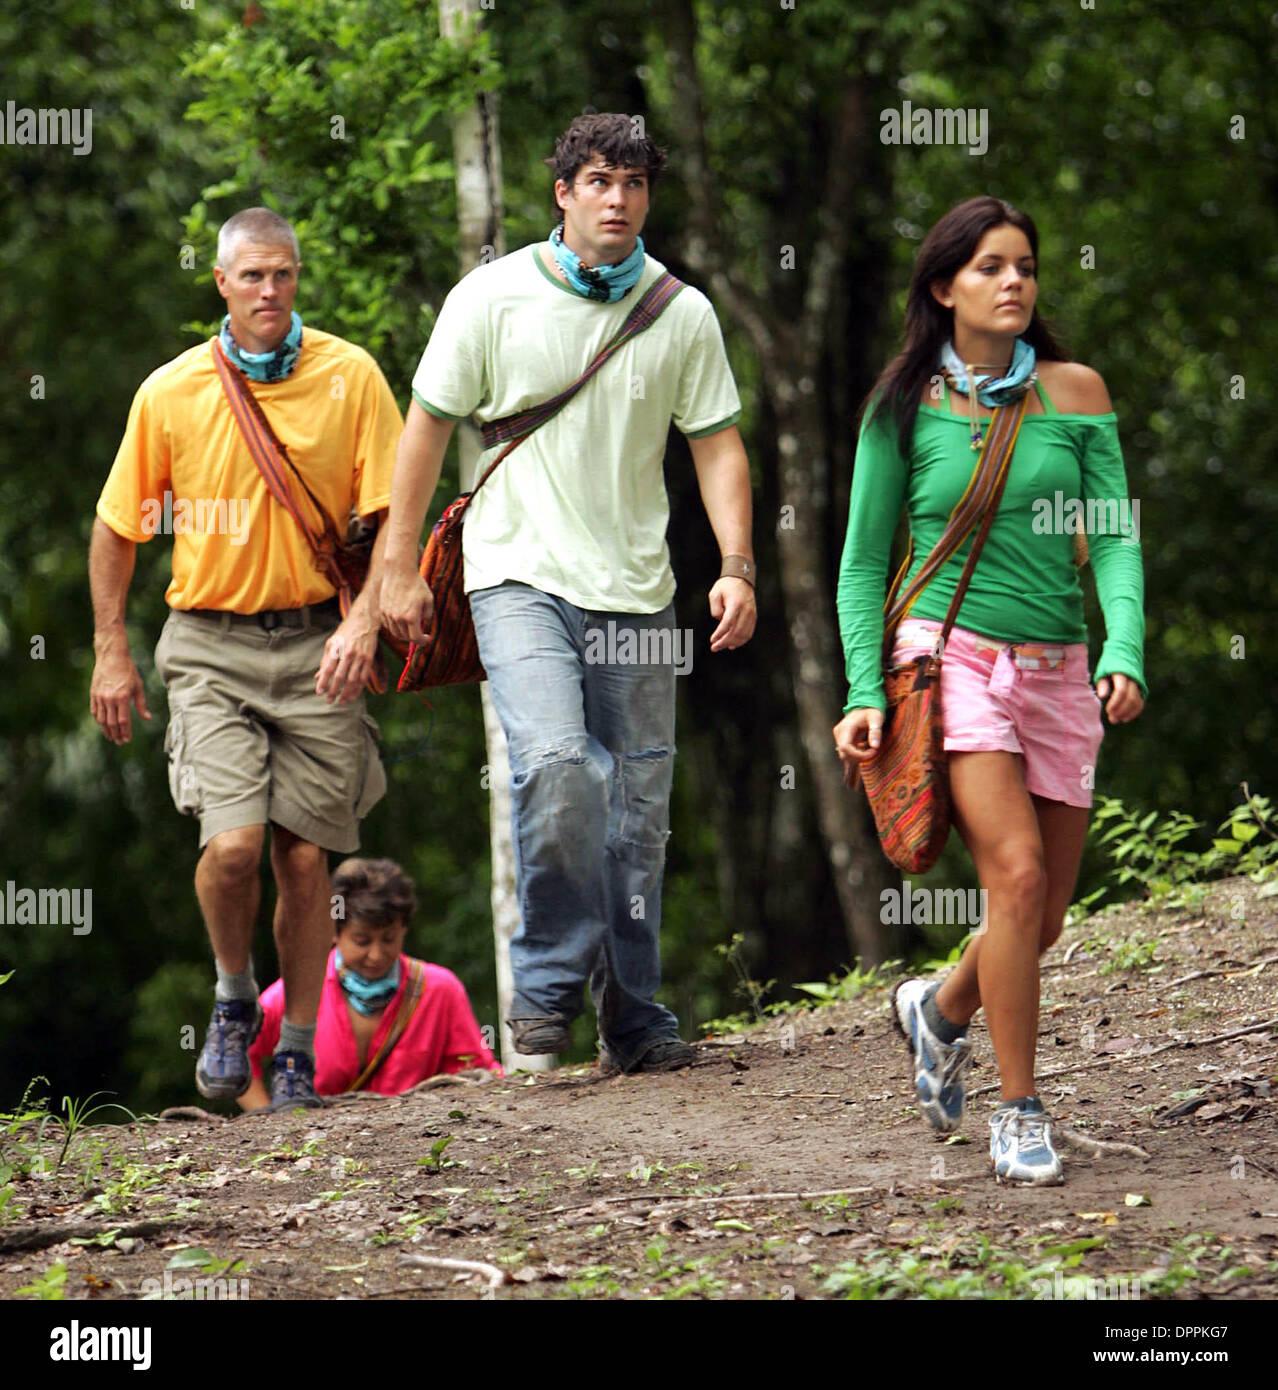 May 4, 2006 - Flores, GUATEMALA - K47725LL.caption: Castaways Gary Hogeboom, Lydia Morales, Jamie Newton and Brian - Stock Image